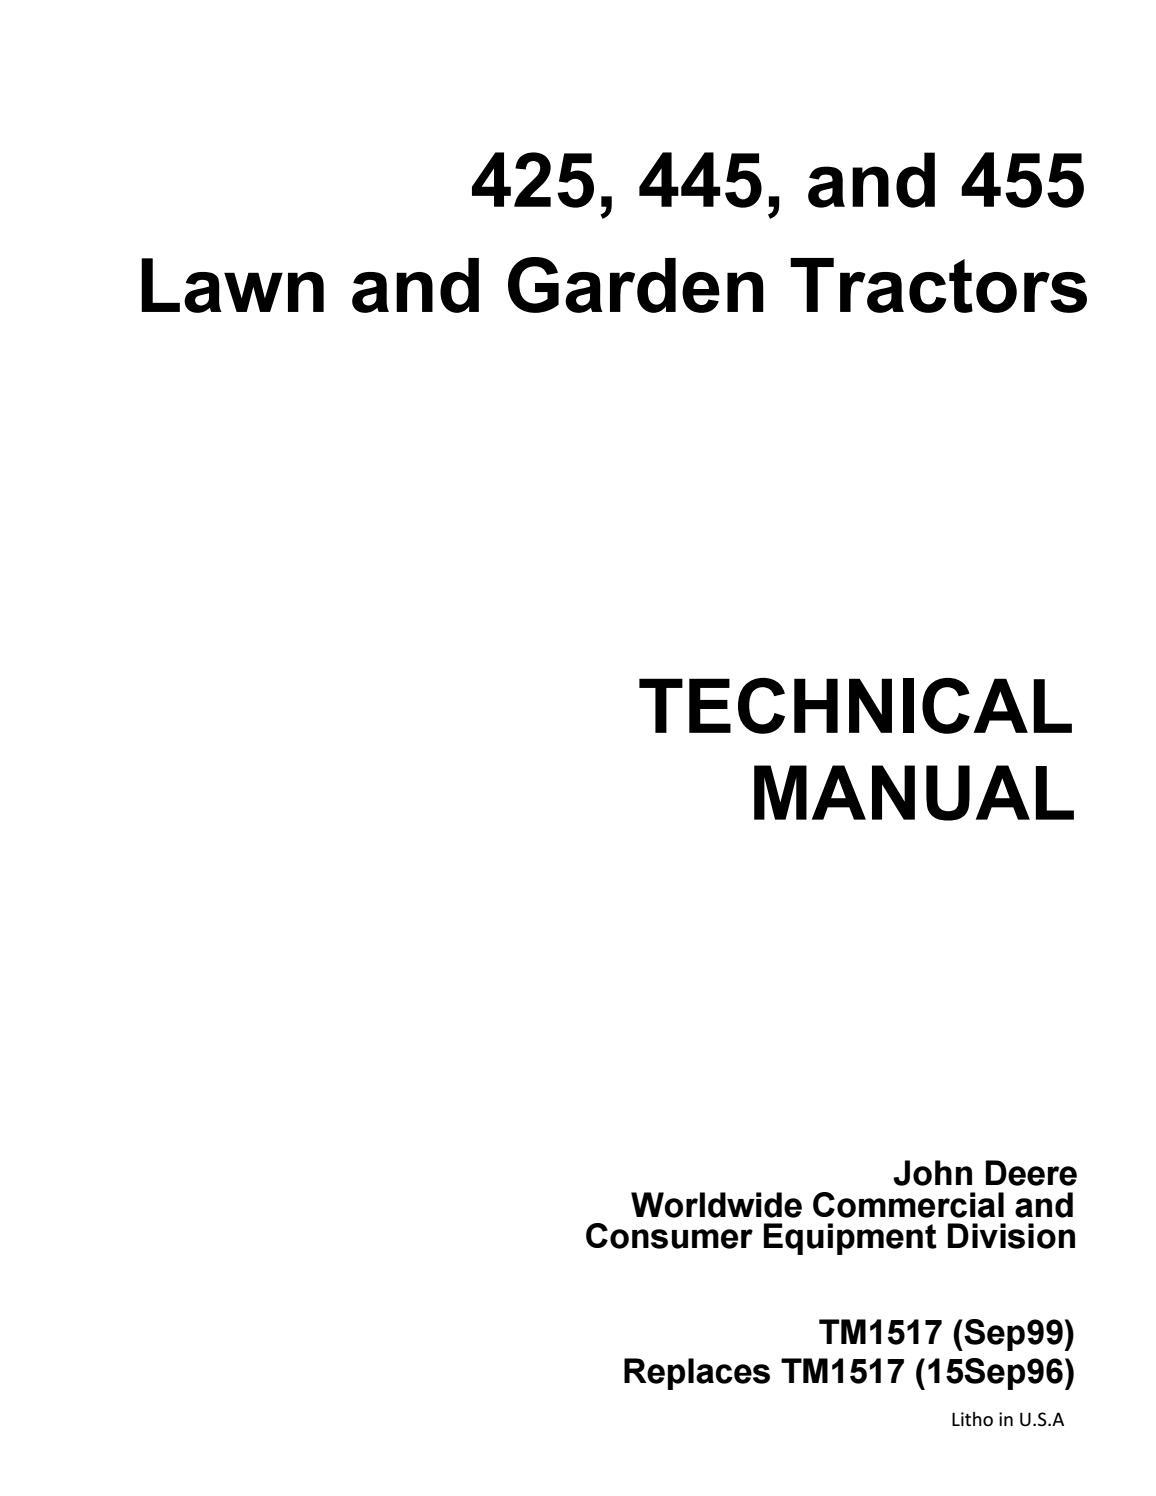 John Deere 425 Lawn Garden Tractor Service Repair Manual By Kjsmfmmf 7 Pin Plug Wiring Diagram Free Download Issuu